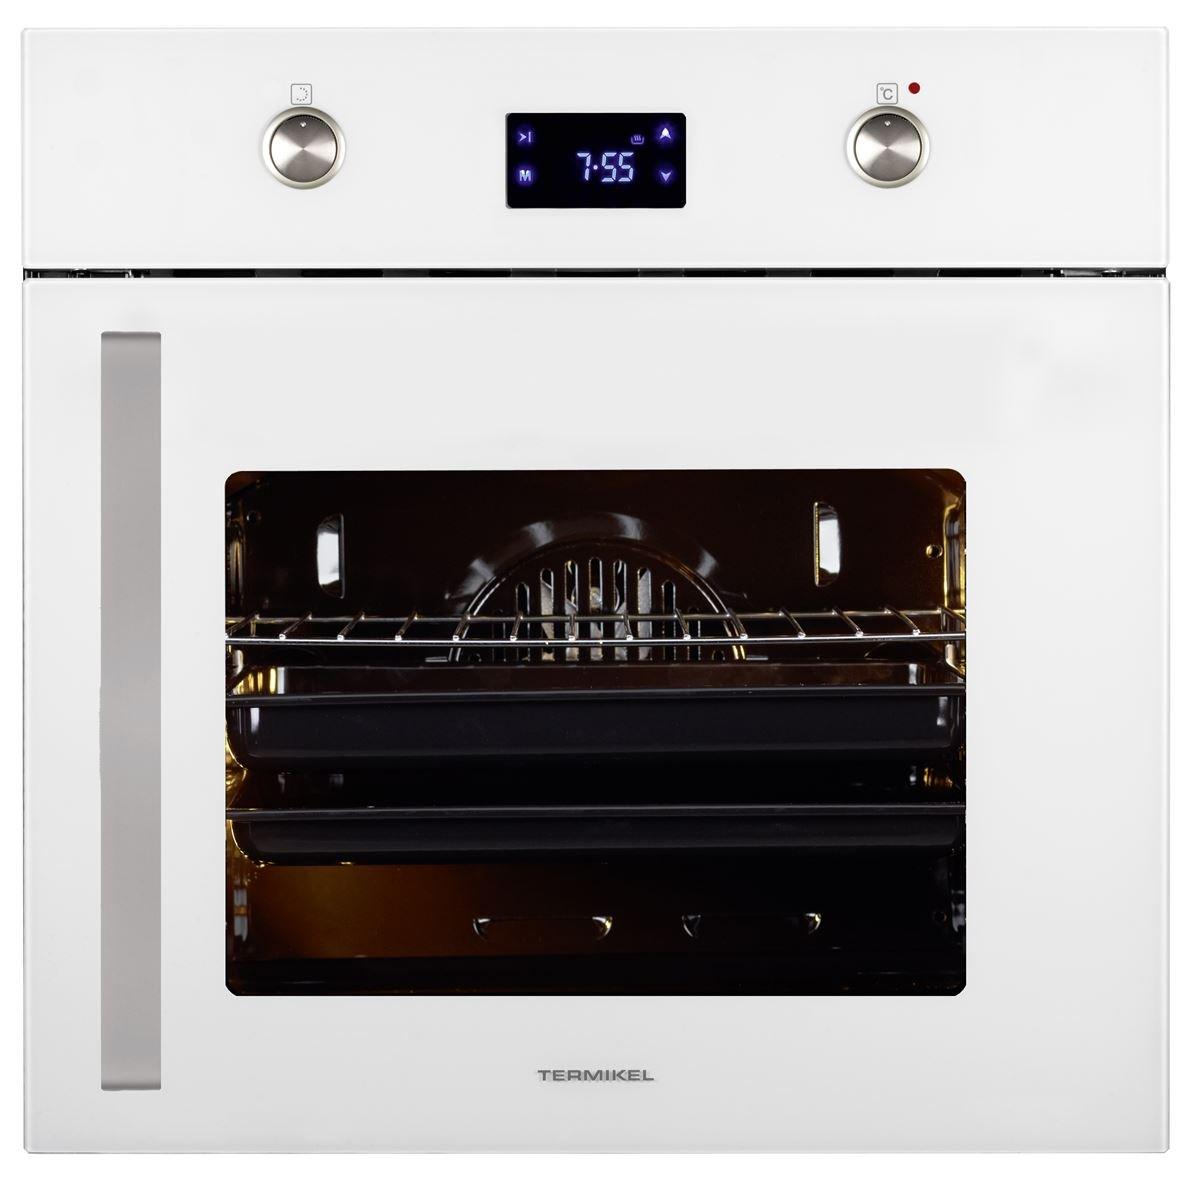 Empotrable - Horno ebi12886wr Color de diseño blanco Apertura de ...